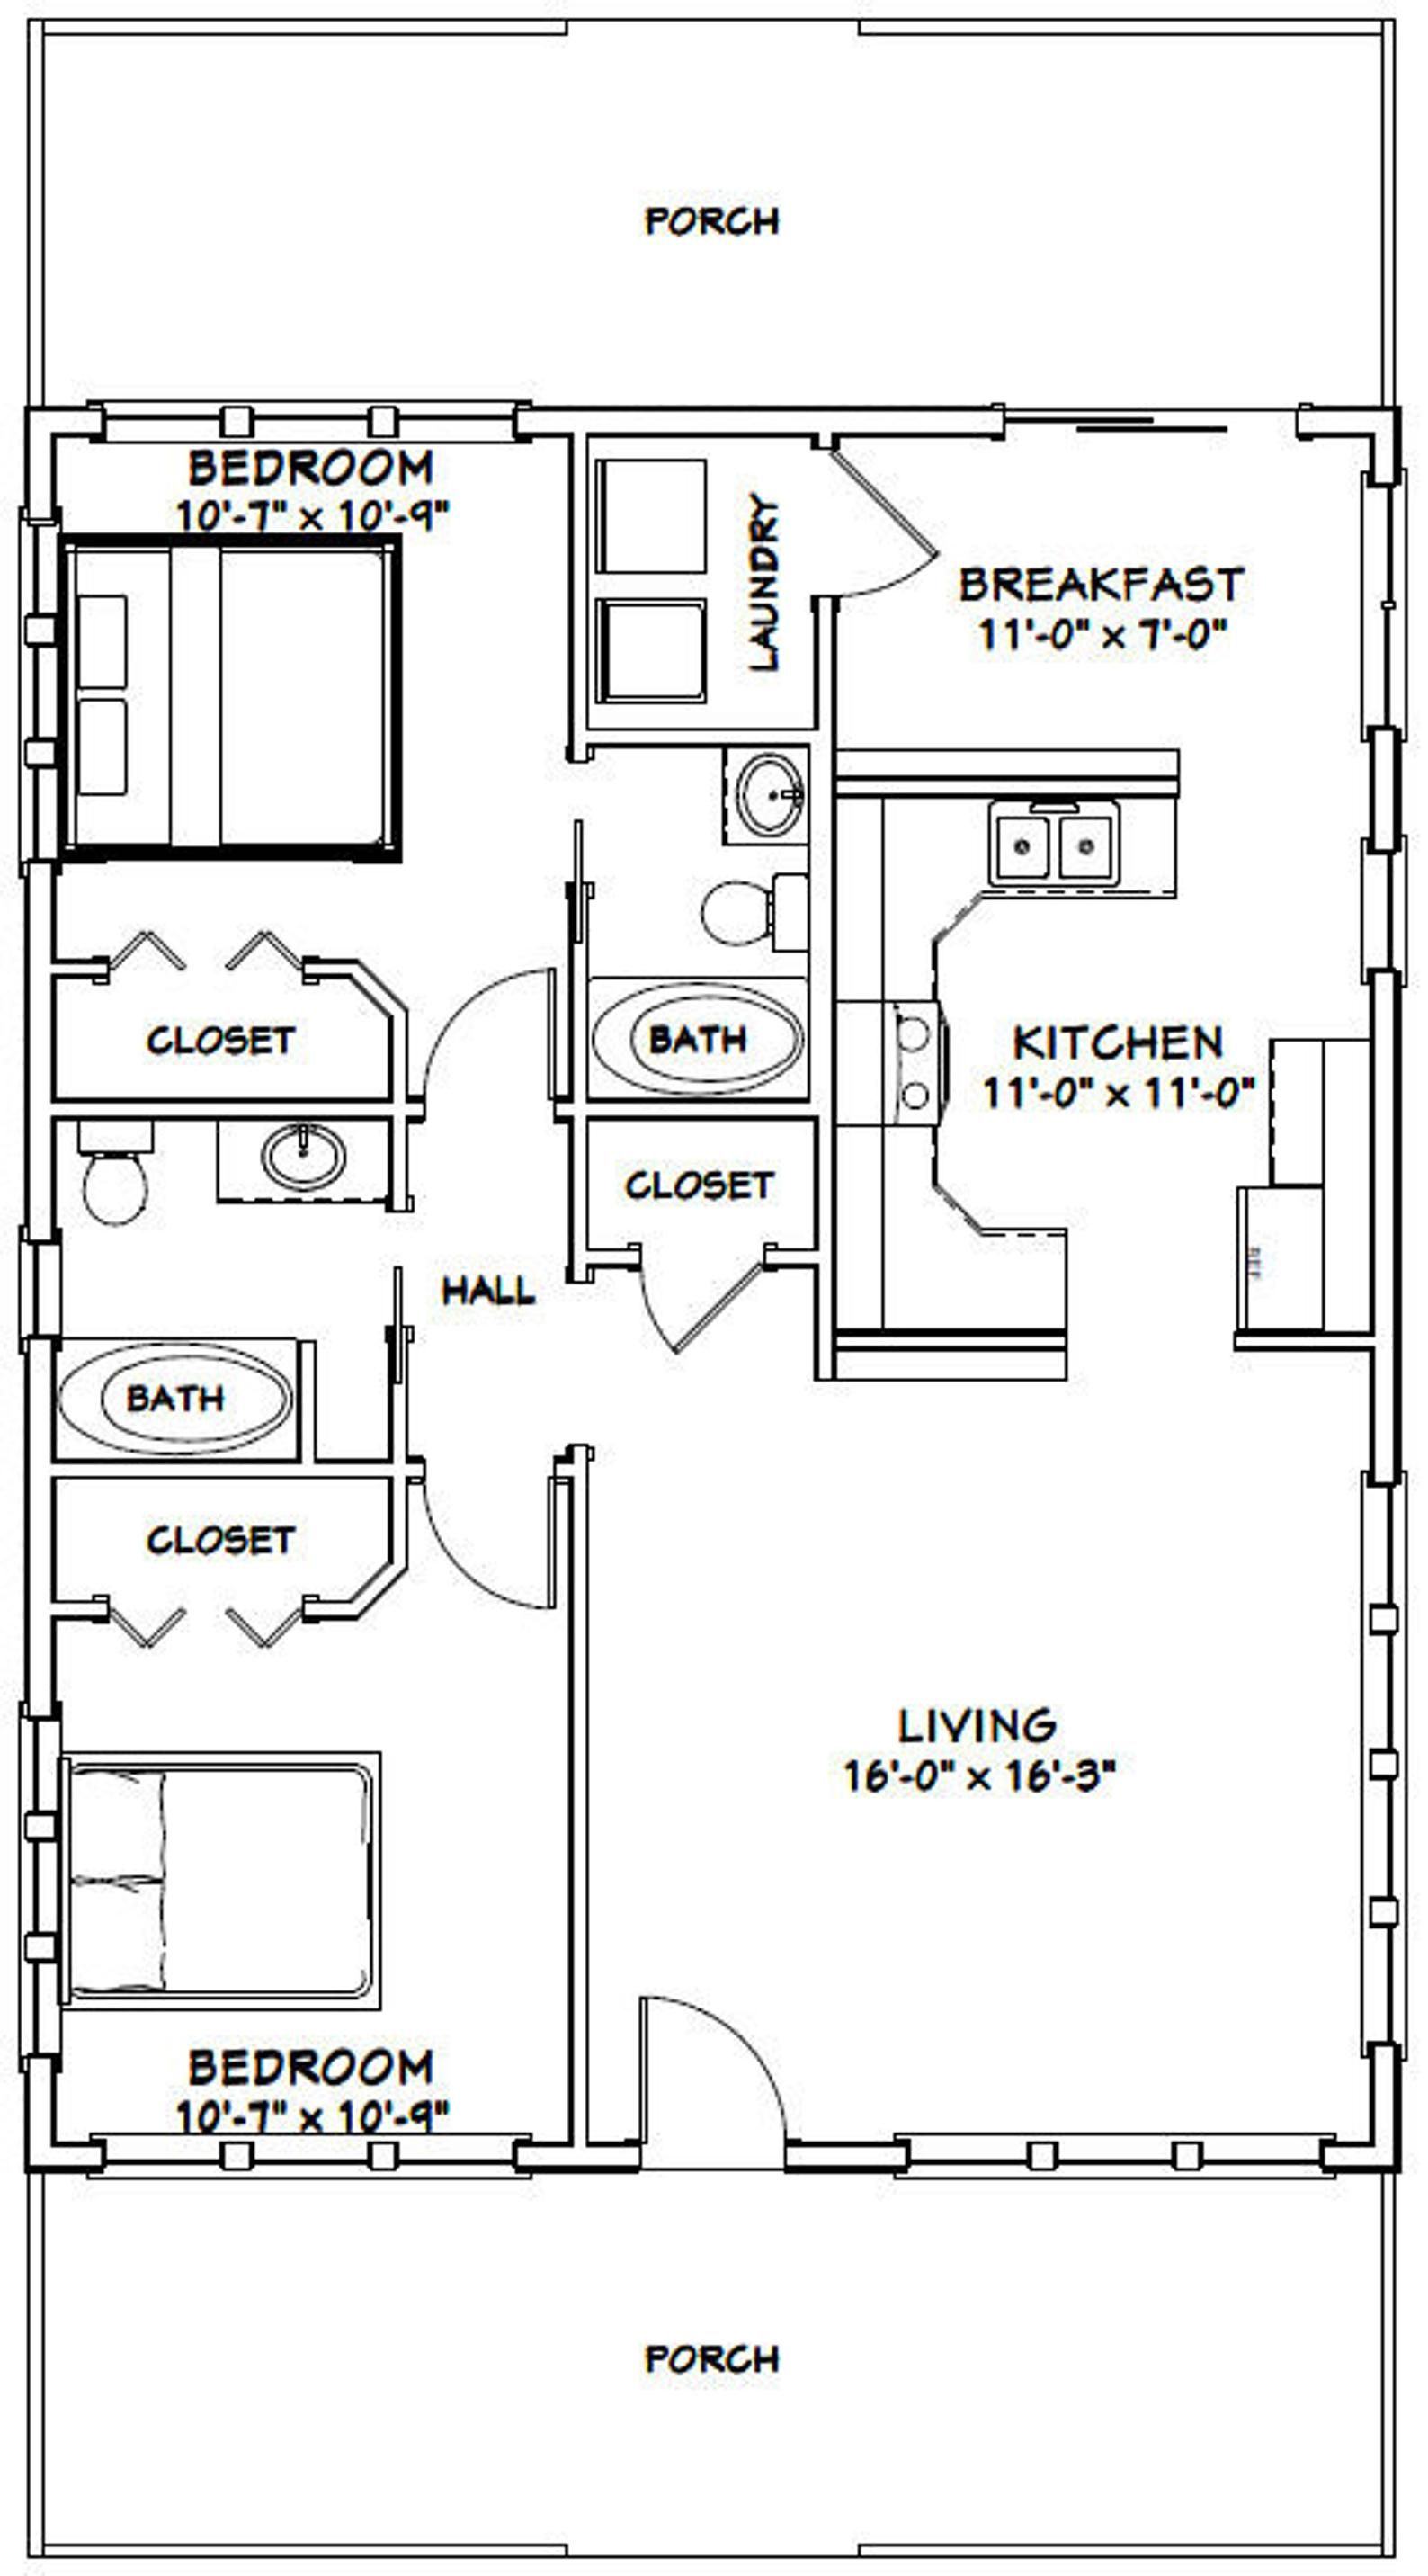 18++ 3 bedroom floor plans pdf info cpns terbaru